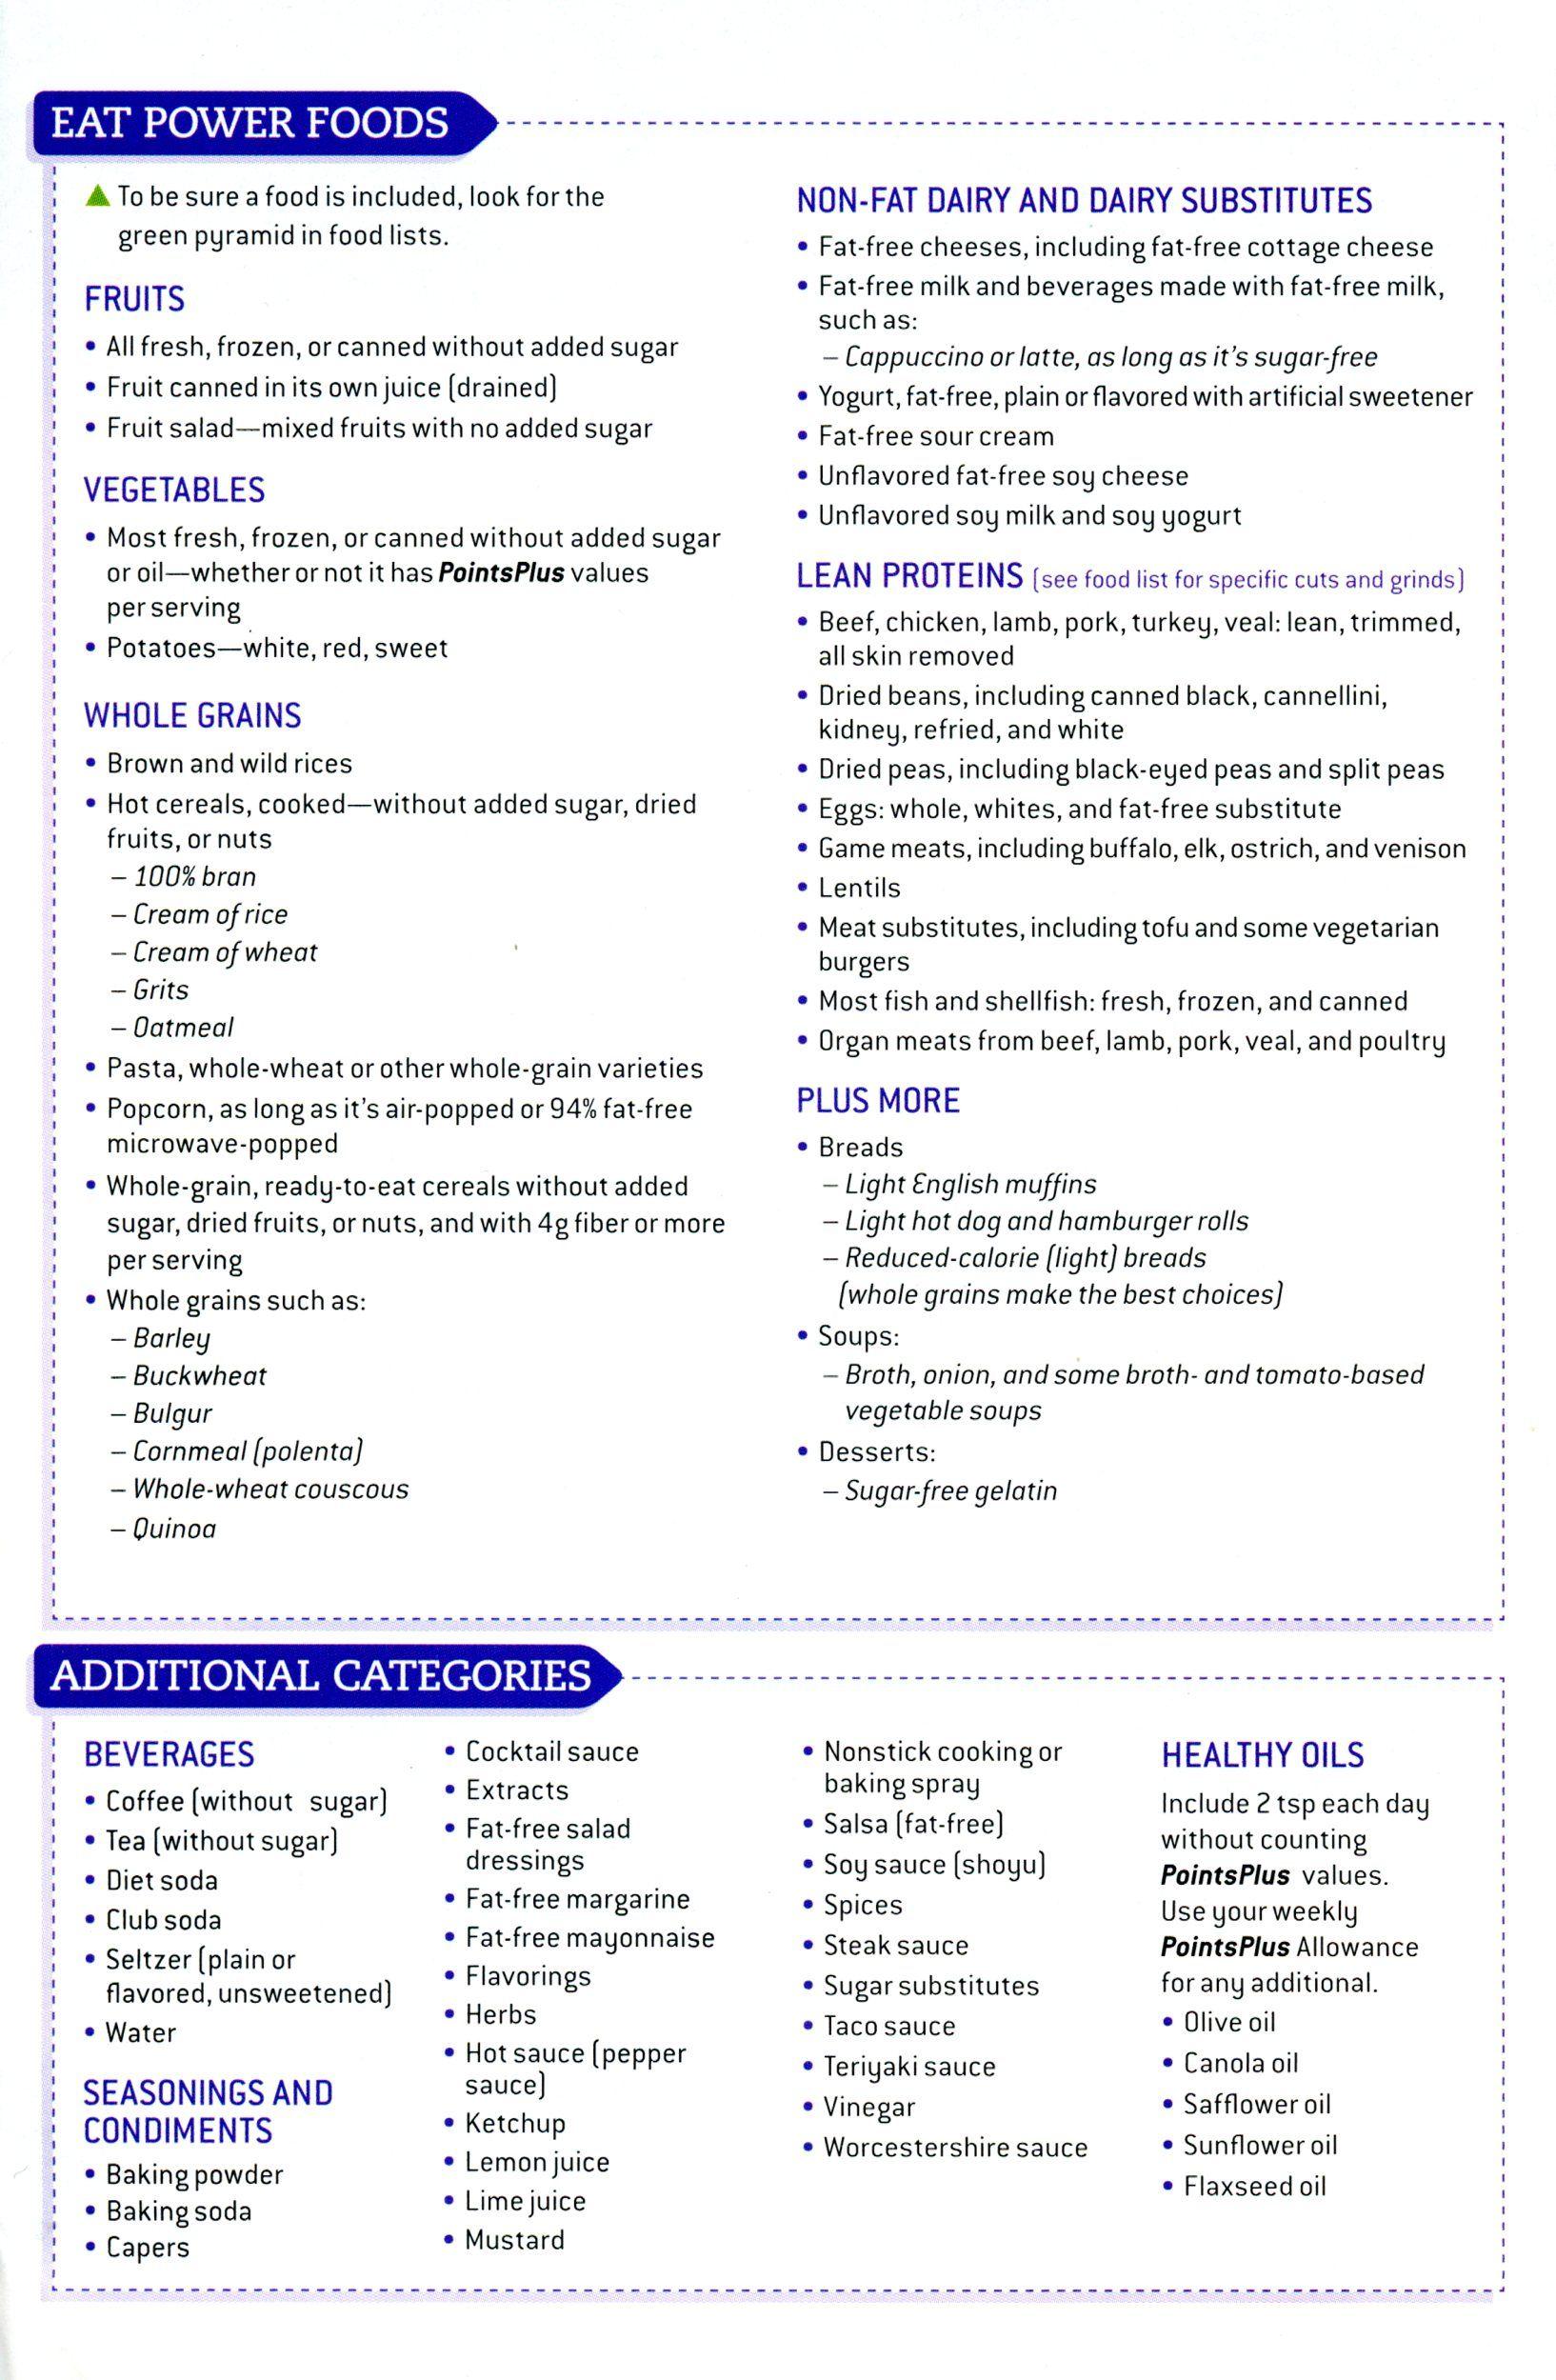 Weight Watchers Simply Filling Worksheet Blog Dandk